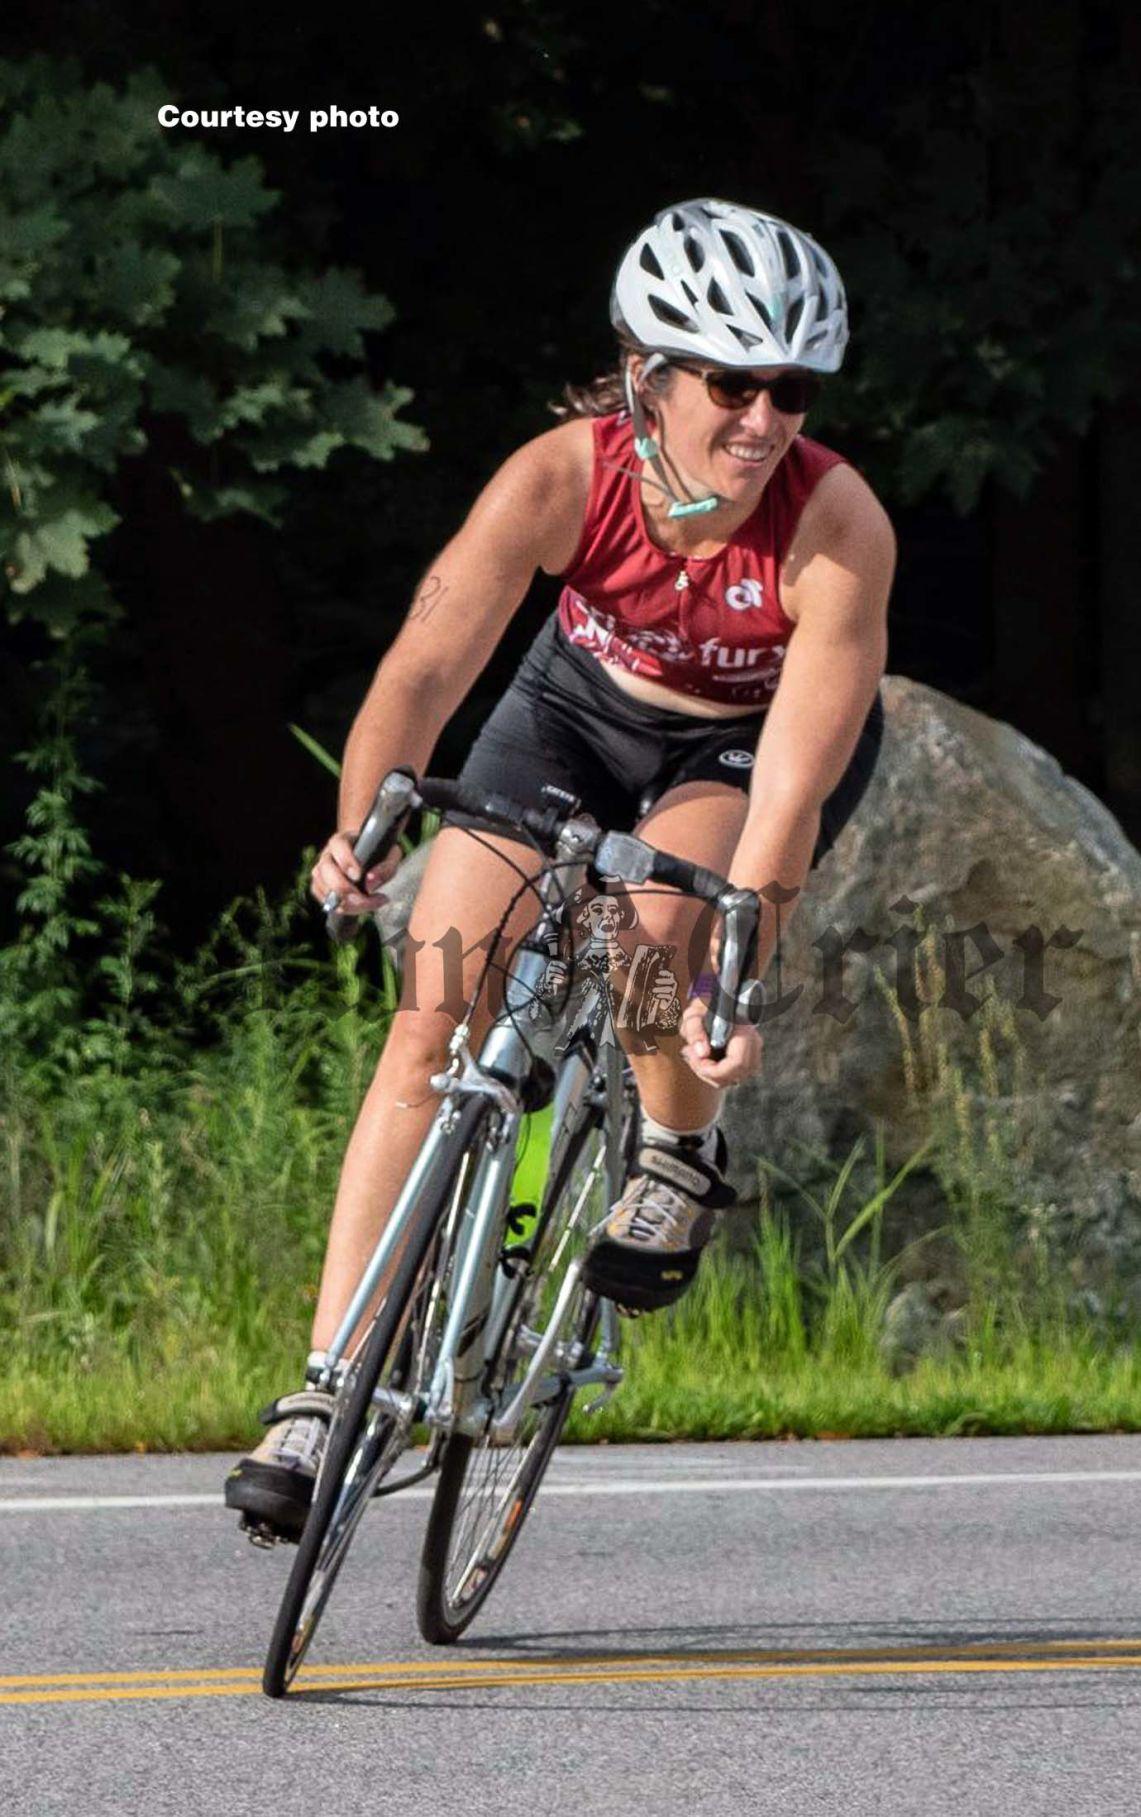 Diane Grove competing in a Triathlon